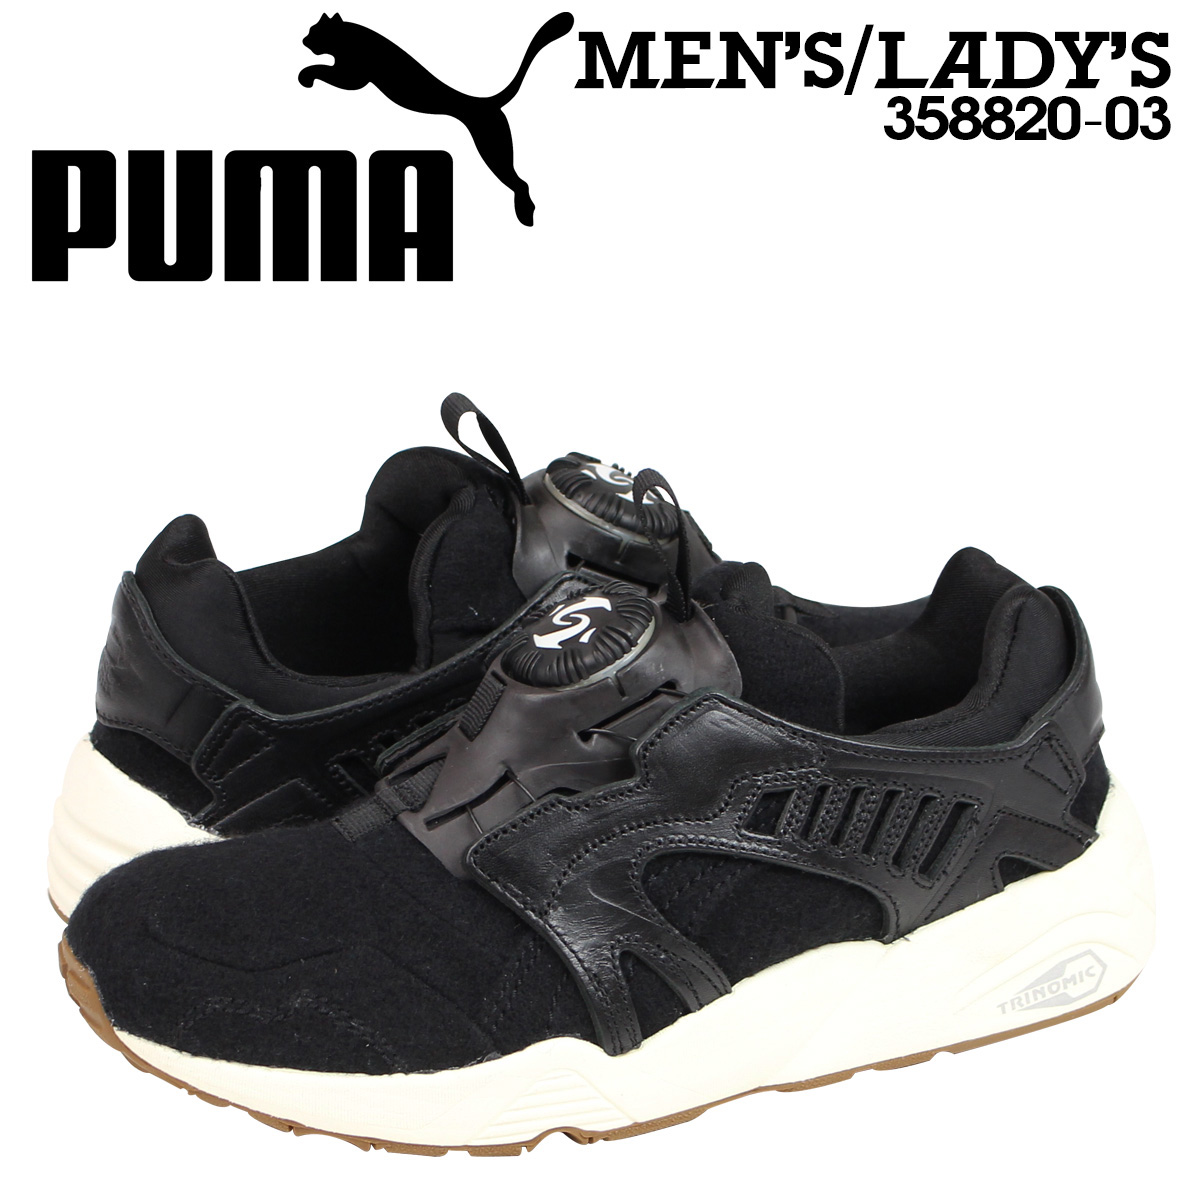 Disc Blaze Felt Sneaker Men Trainers 358820 03 Black